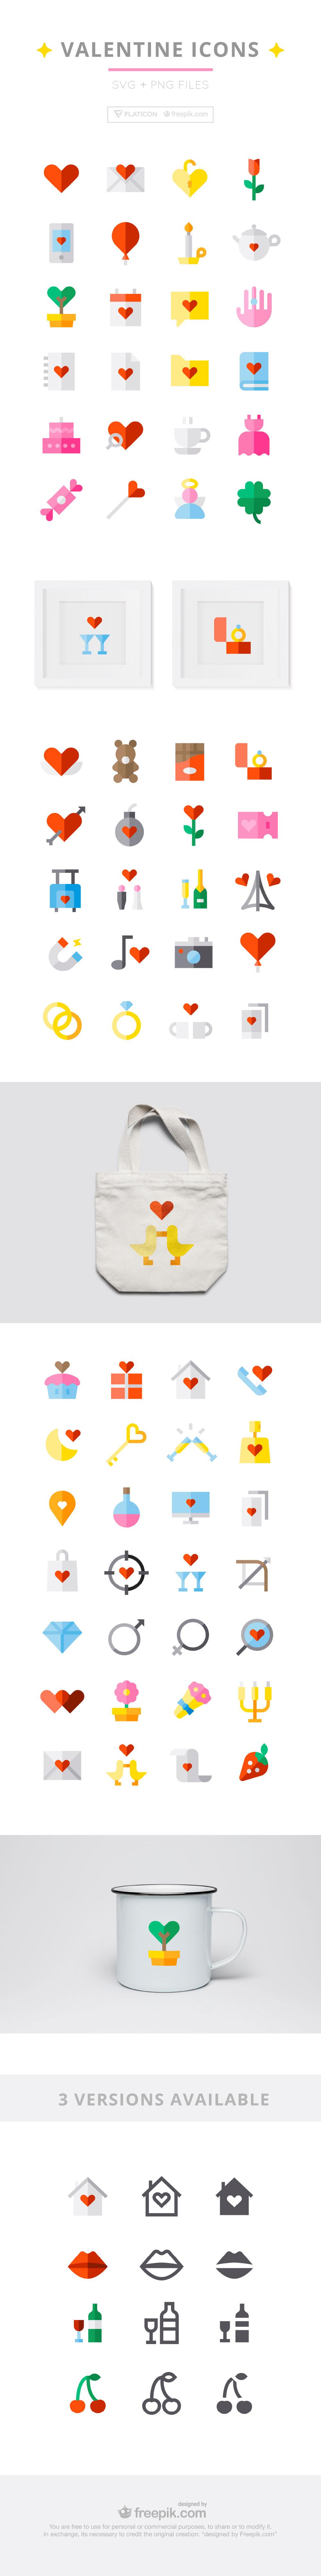 Valentines Day Icons